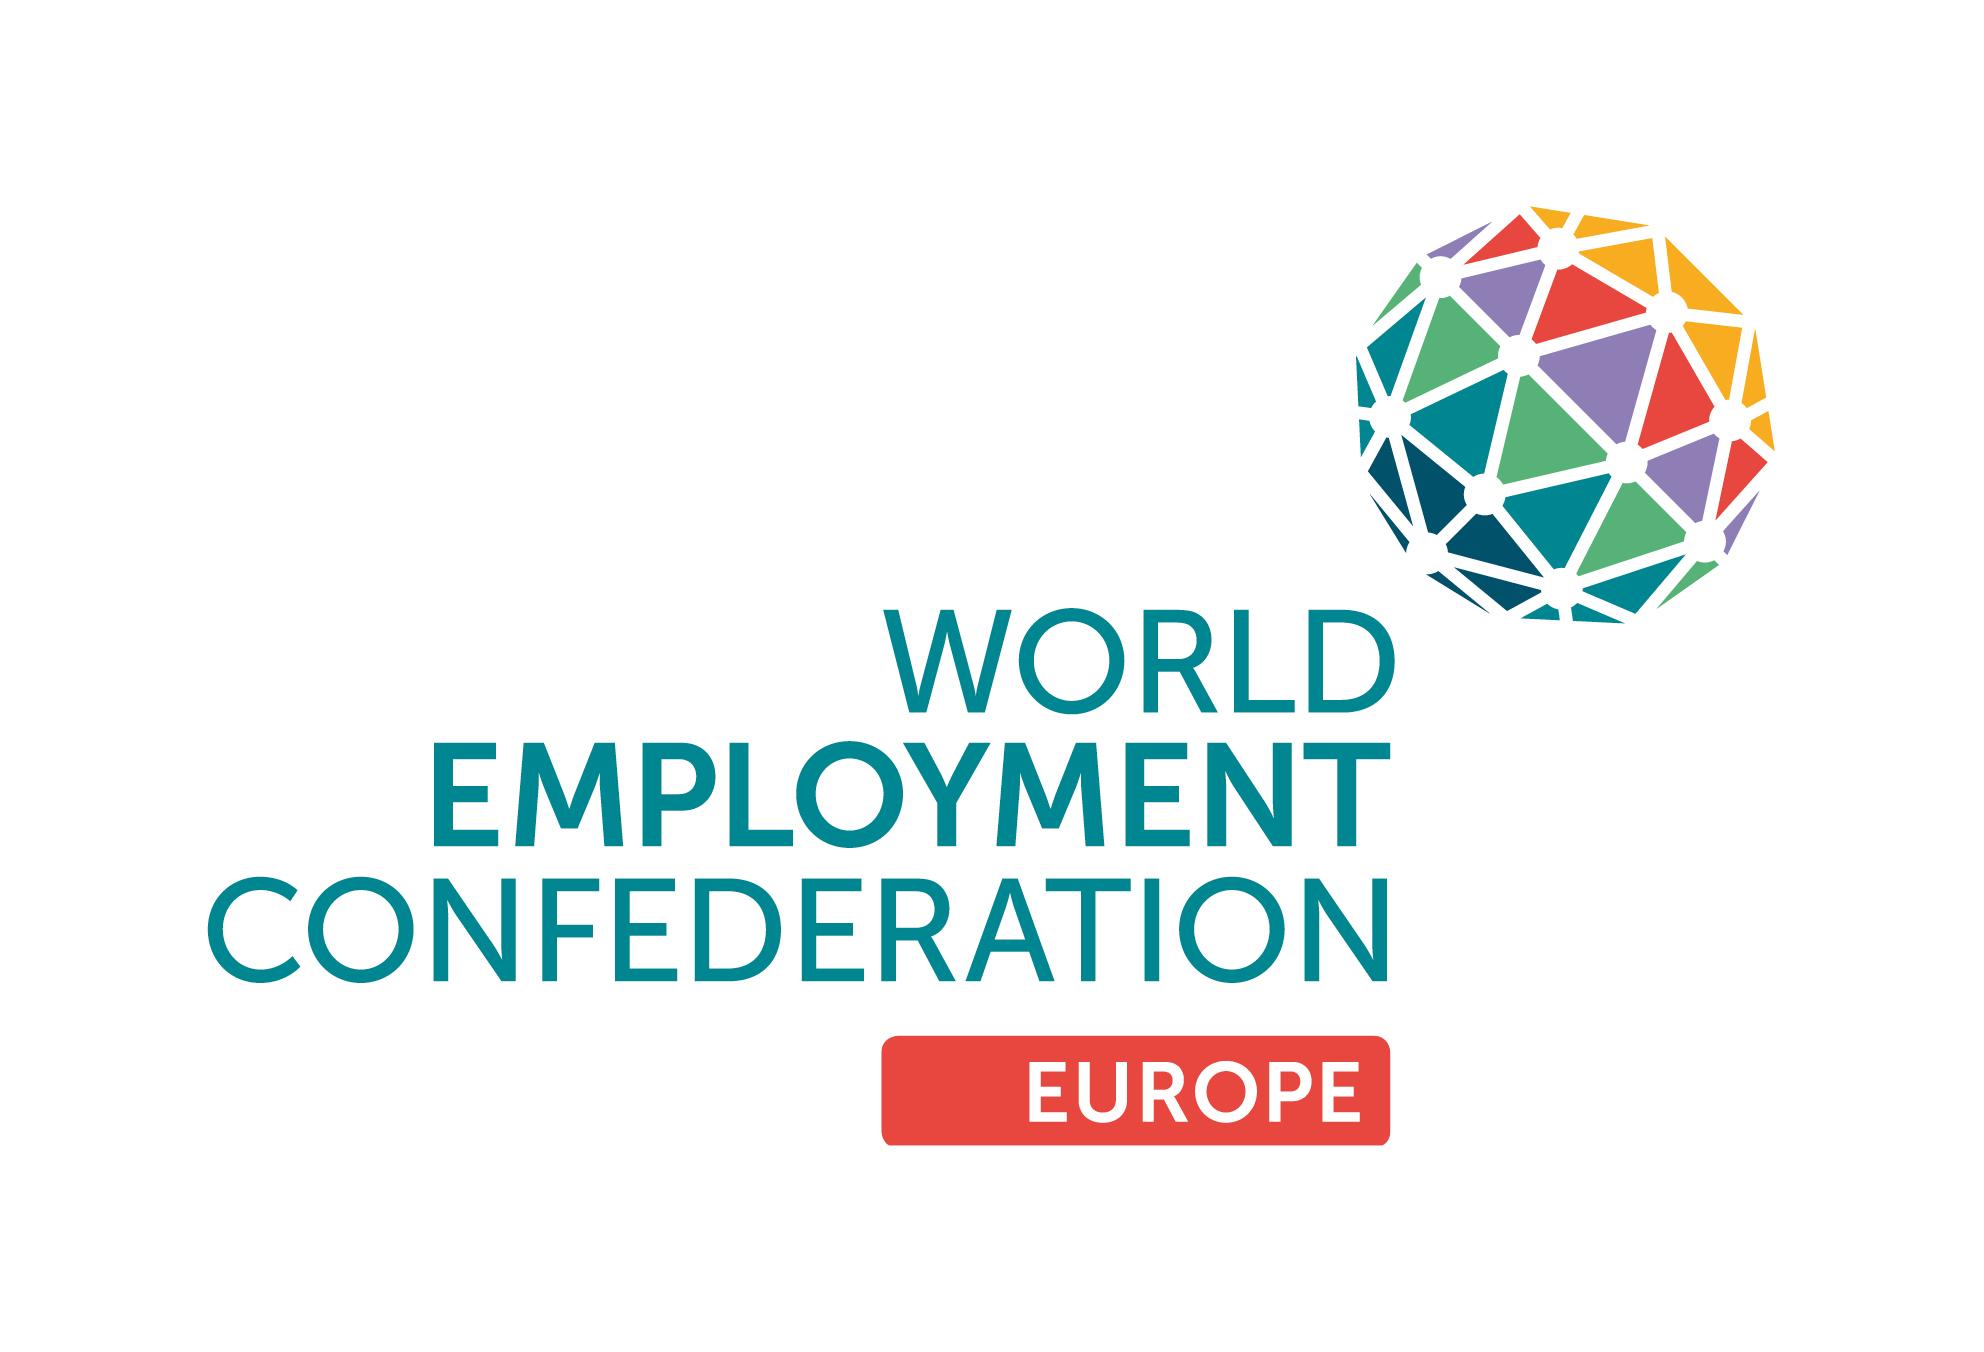 World Employment Confederation (WEC)